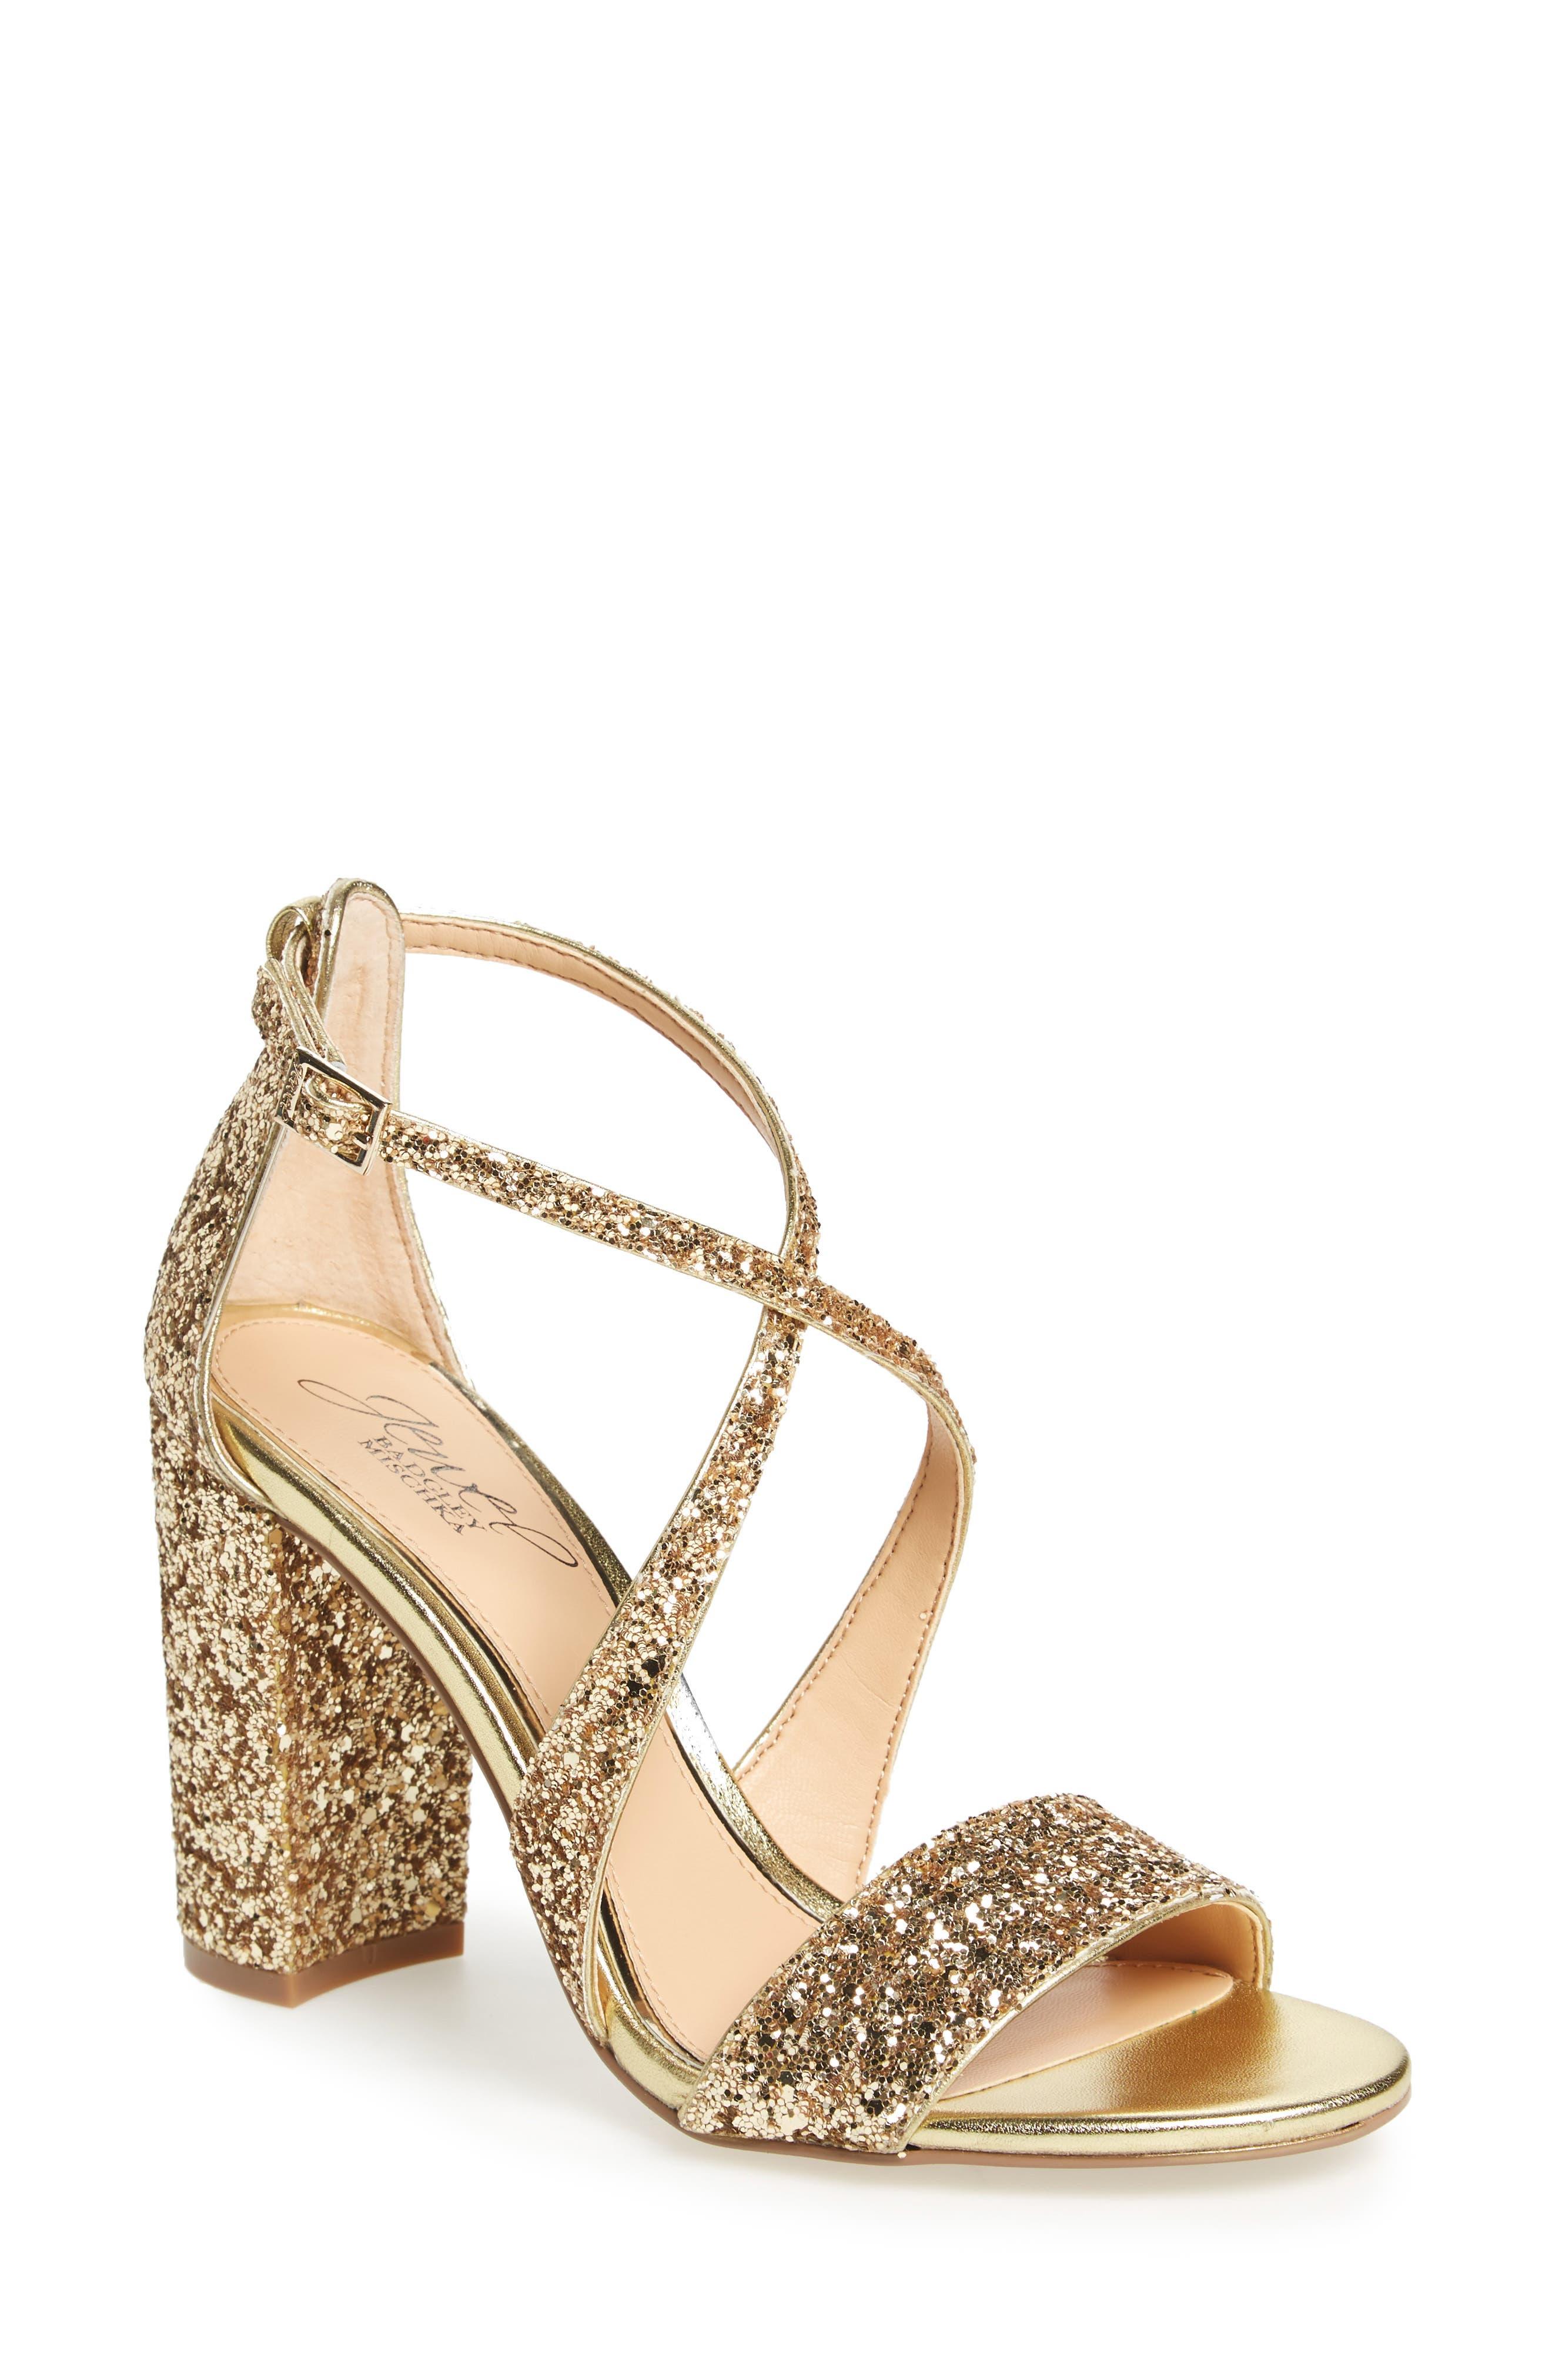 Cook Block Heel Glitter Sandal,                             Main thumbnail 1, color,                             GOLD LEATHER